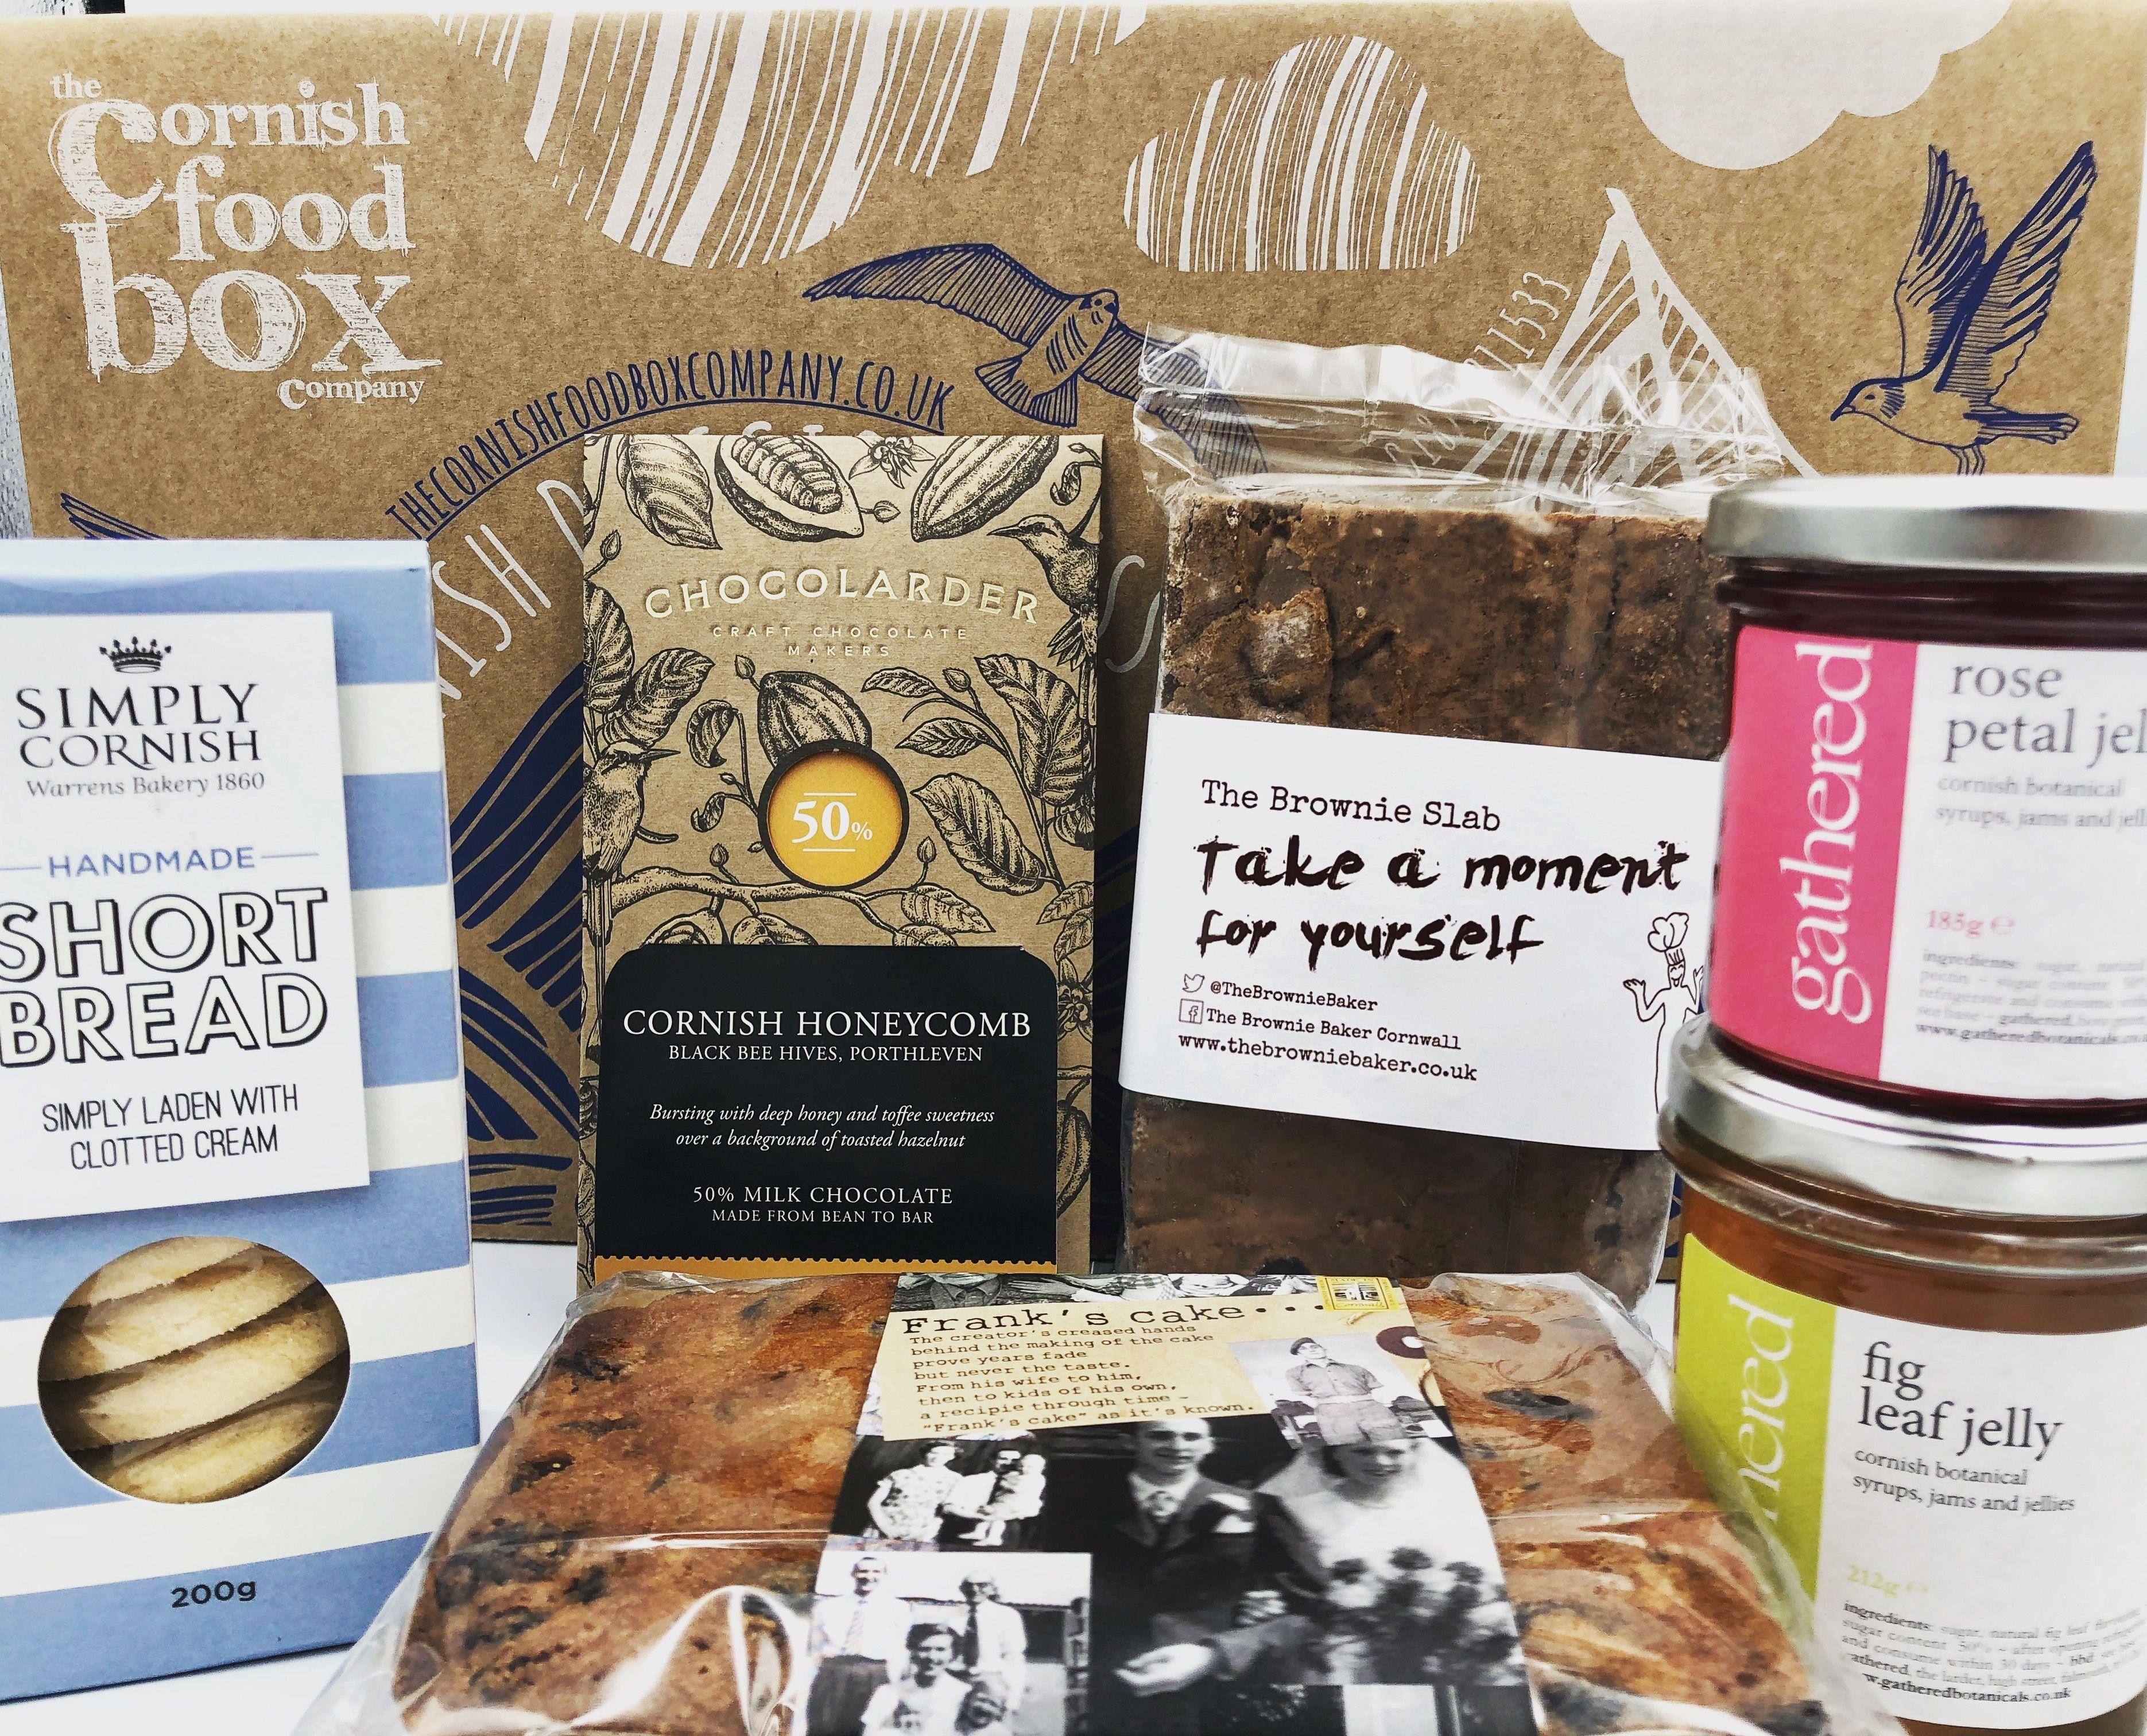 Cornish Hampers Hampers Gifts The Cornish Food Box Company